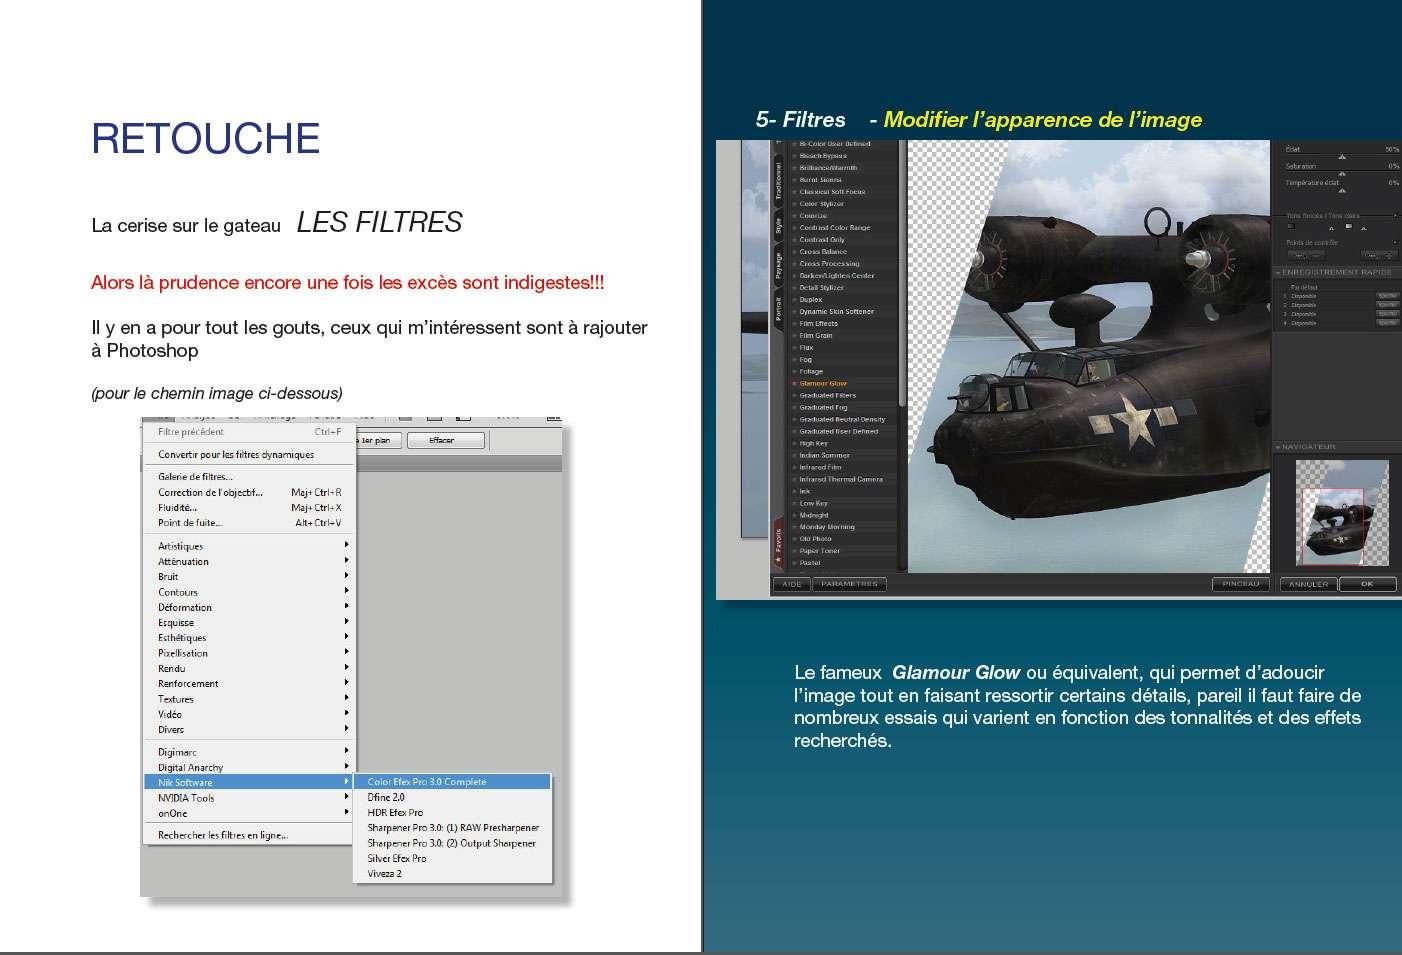 http://img835.imageshack.us/img835/7476/tutoretouche091.jpg